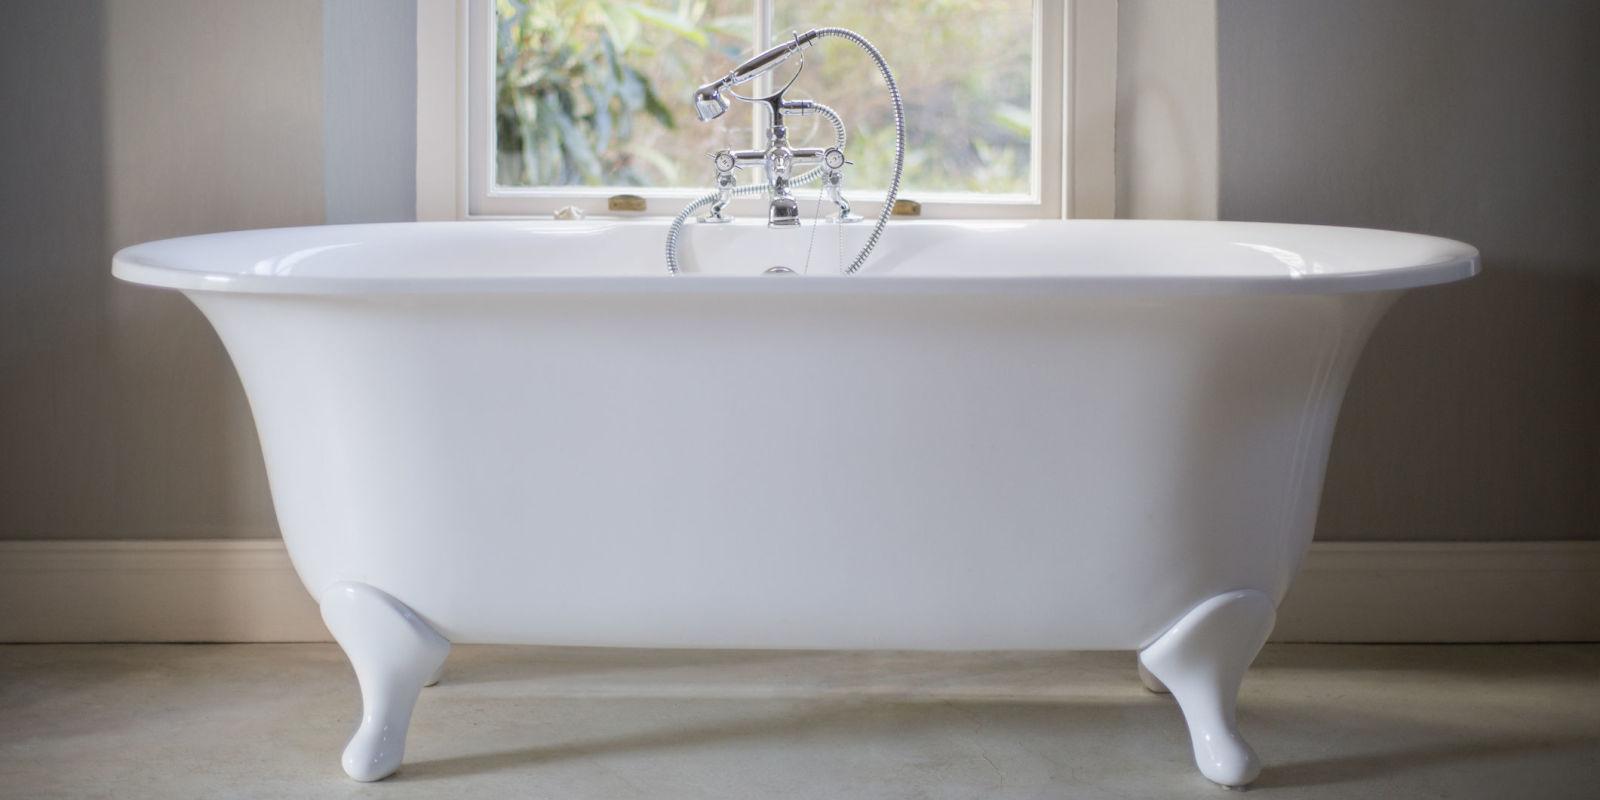 Replacing a retro coloured bathroom suite - Freestanding White Bath In Bare Bathroom